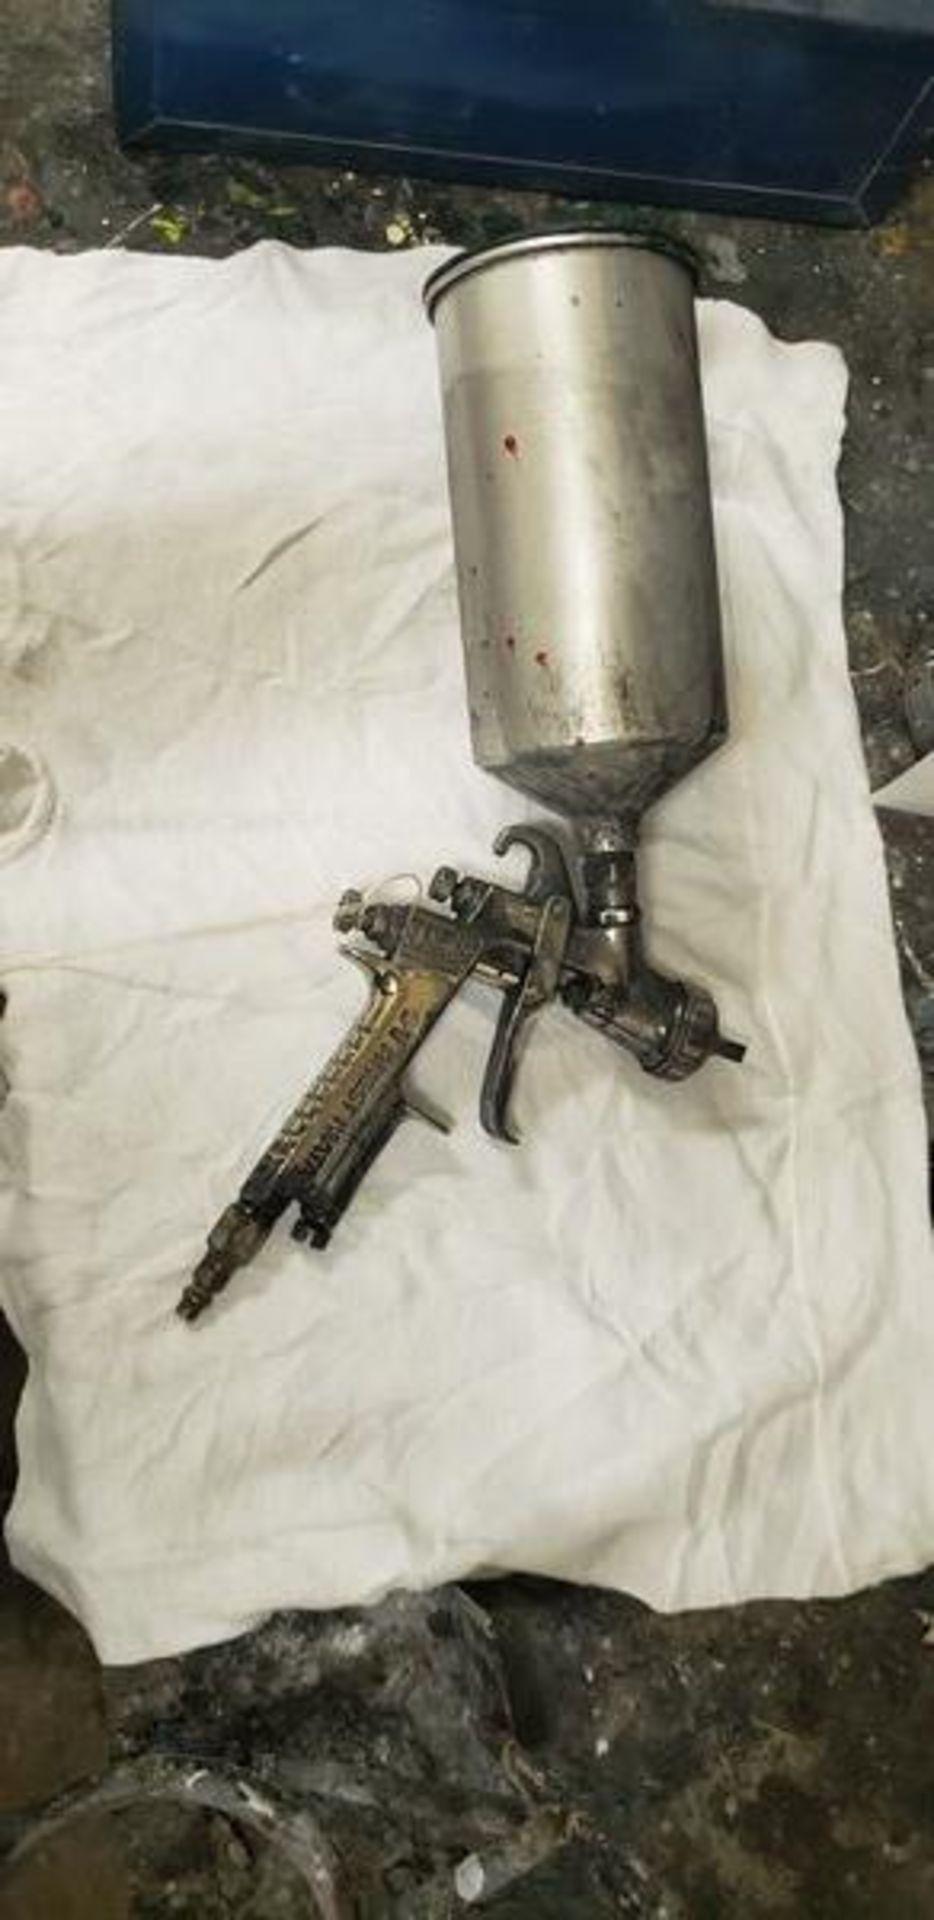 ANESTIWAT LPH 400 SPRAY GUN